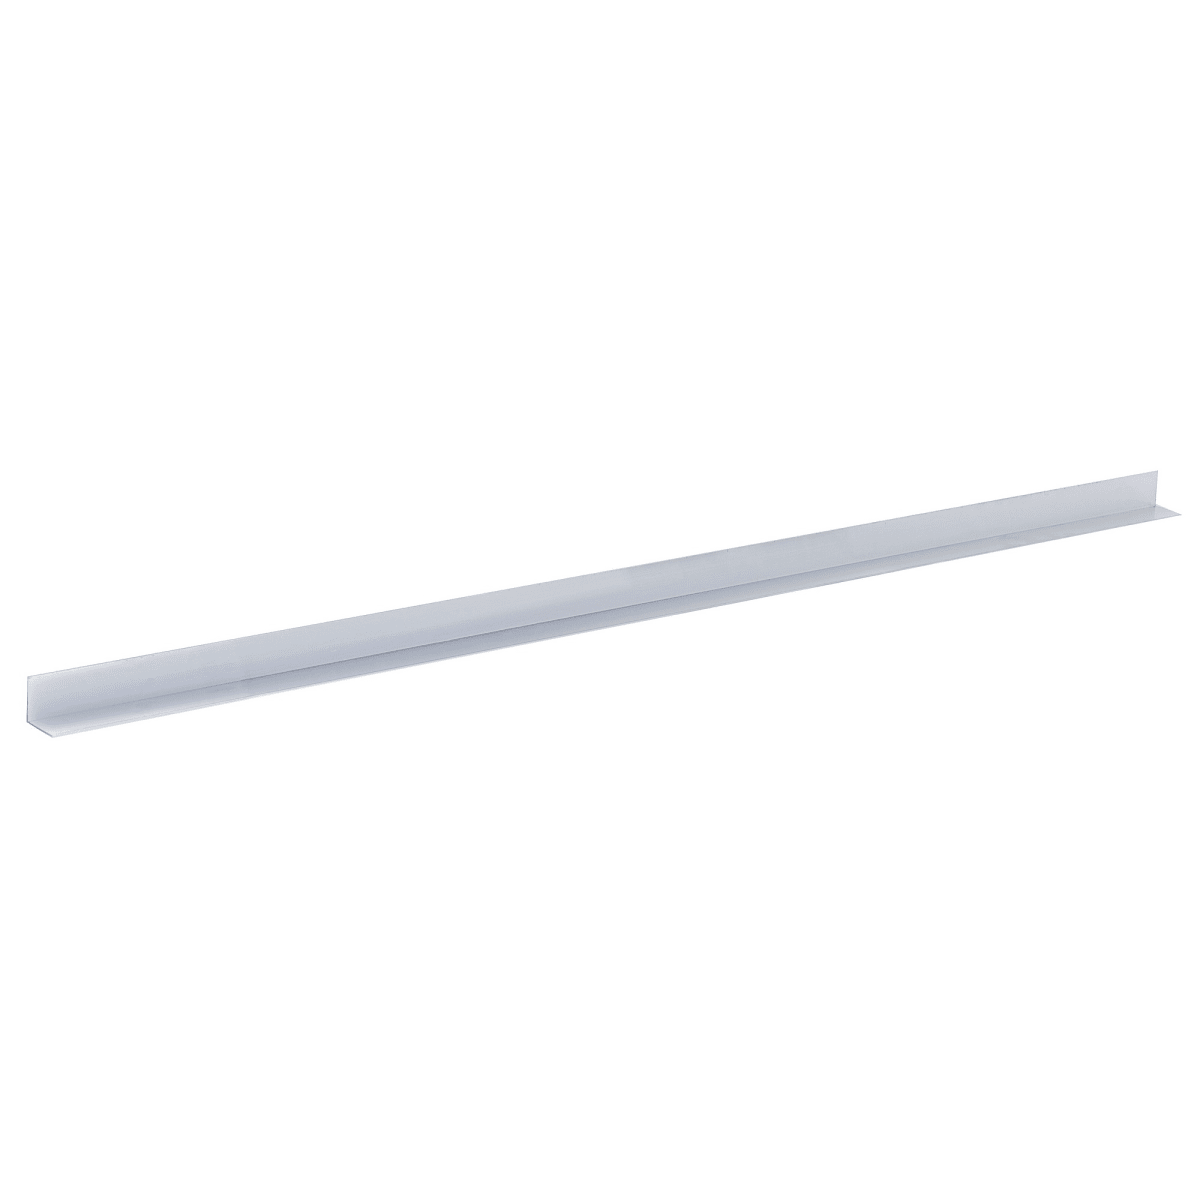 Профиль алюминиевый угловой 30х30х1.5x1000 мм